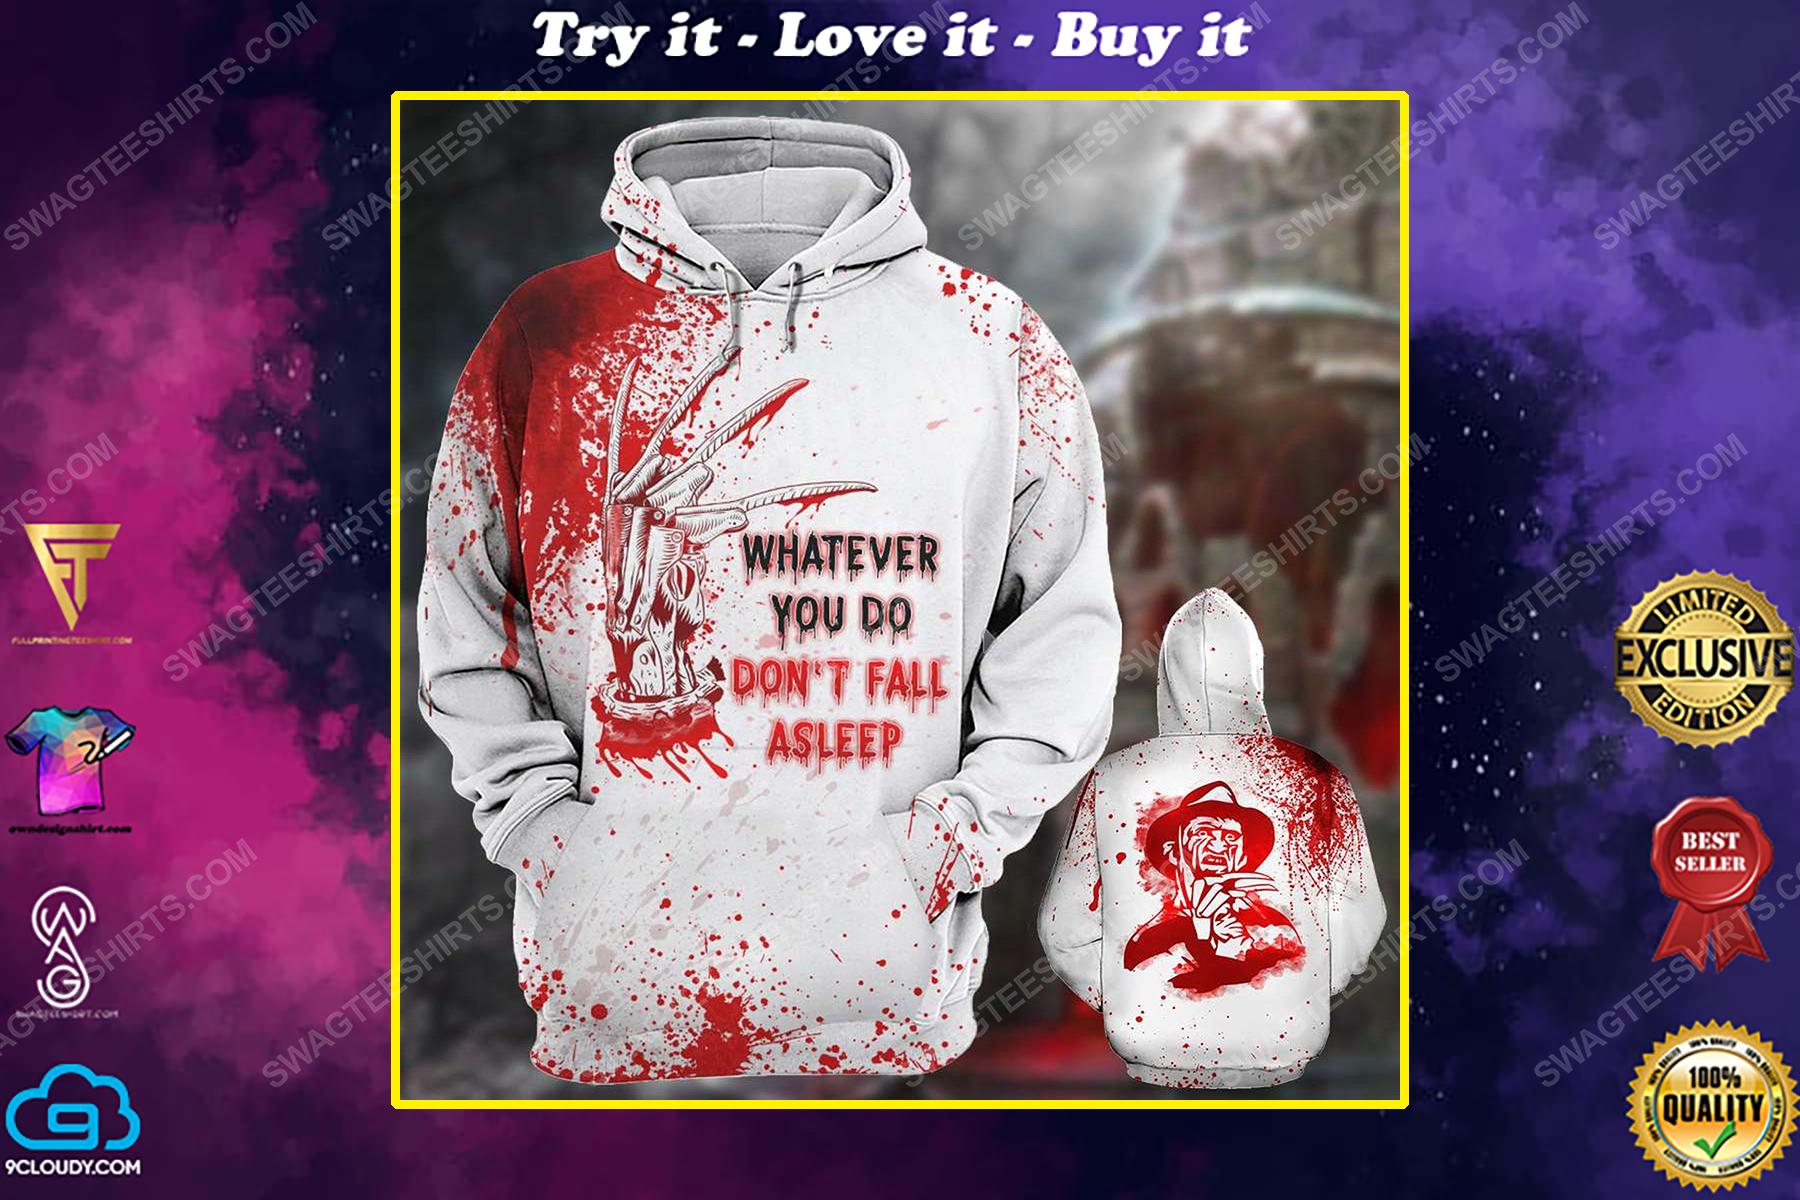 Halloween blood whatever you do don't fall asleep freddy full print shirt